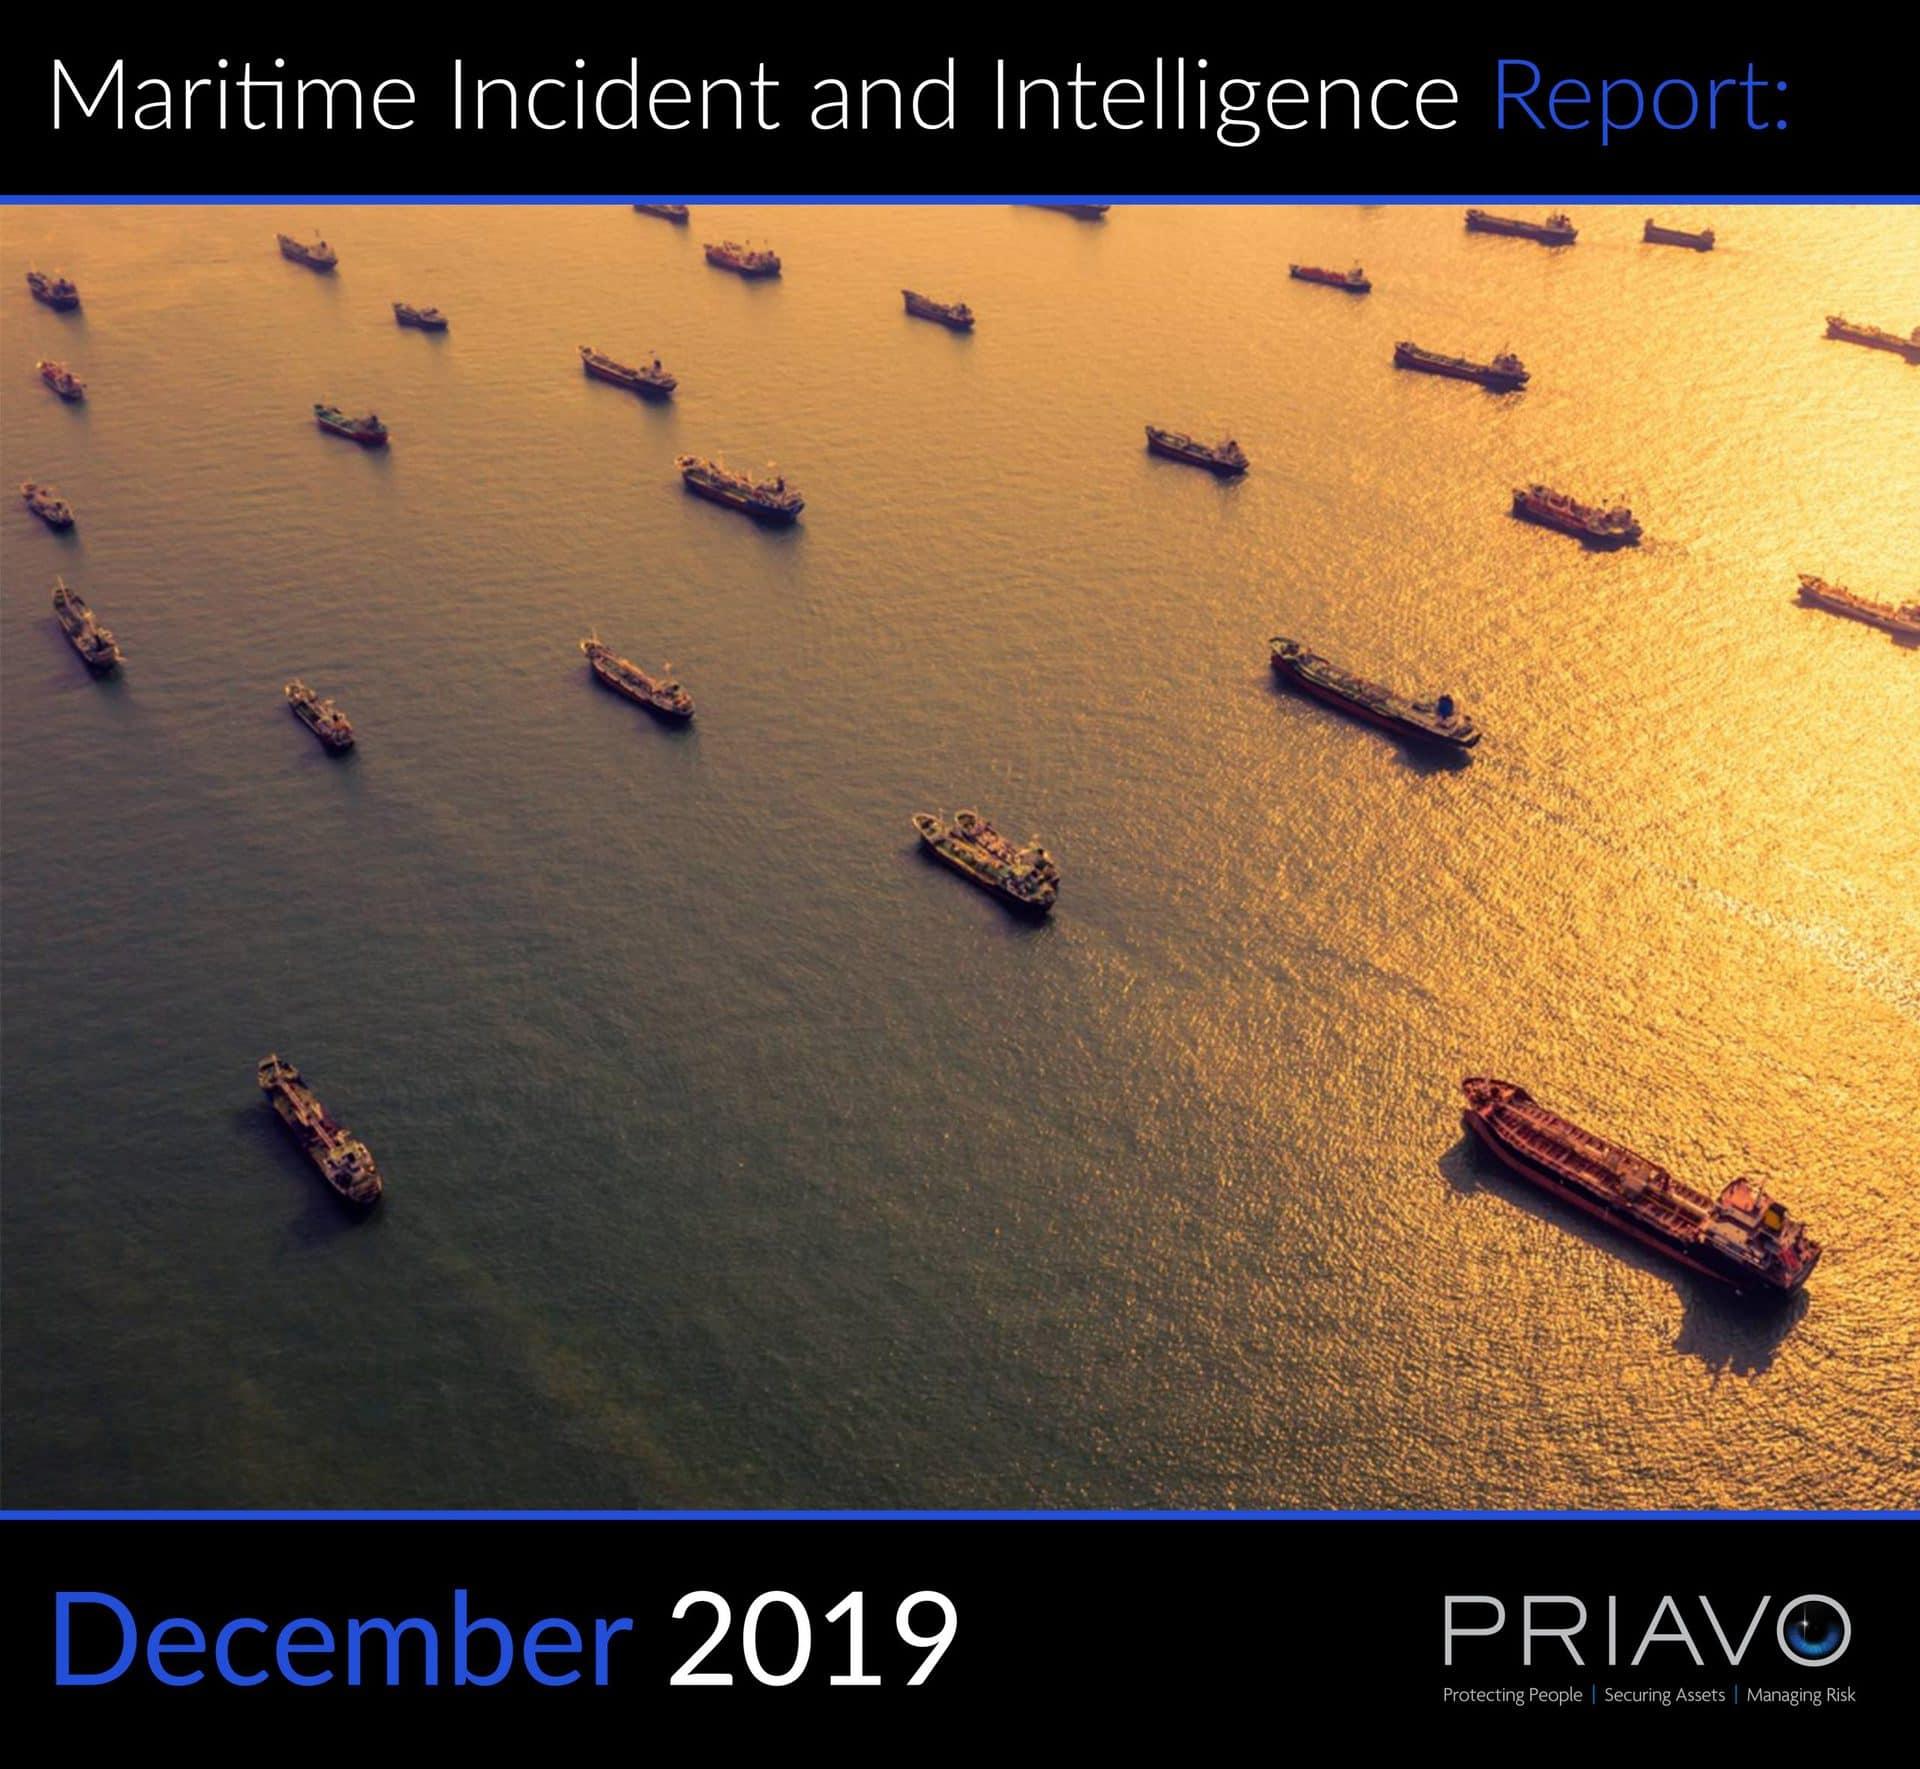 Maritime Incident Report: December 2019